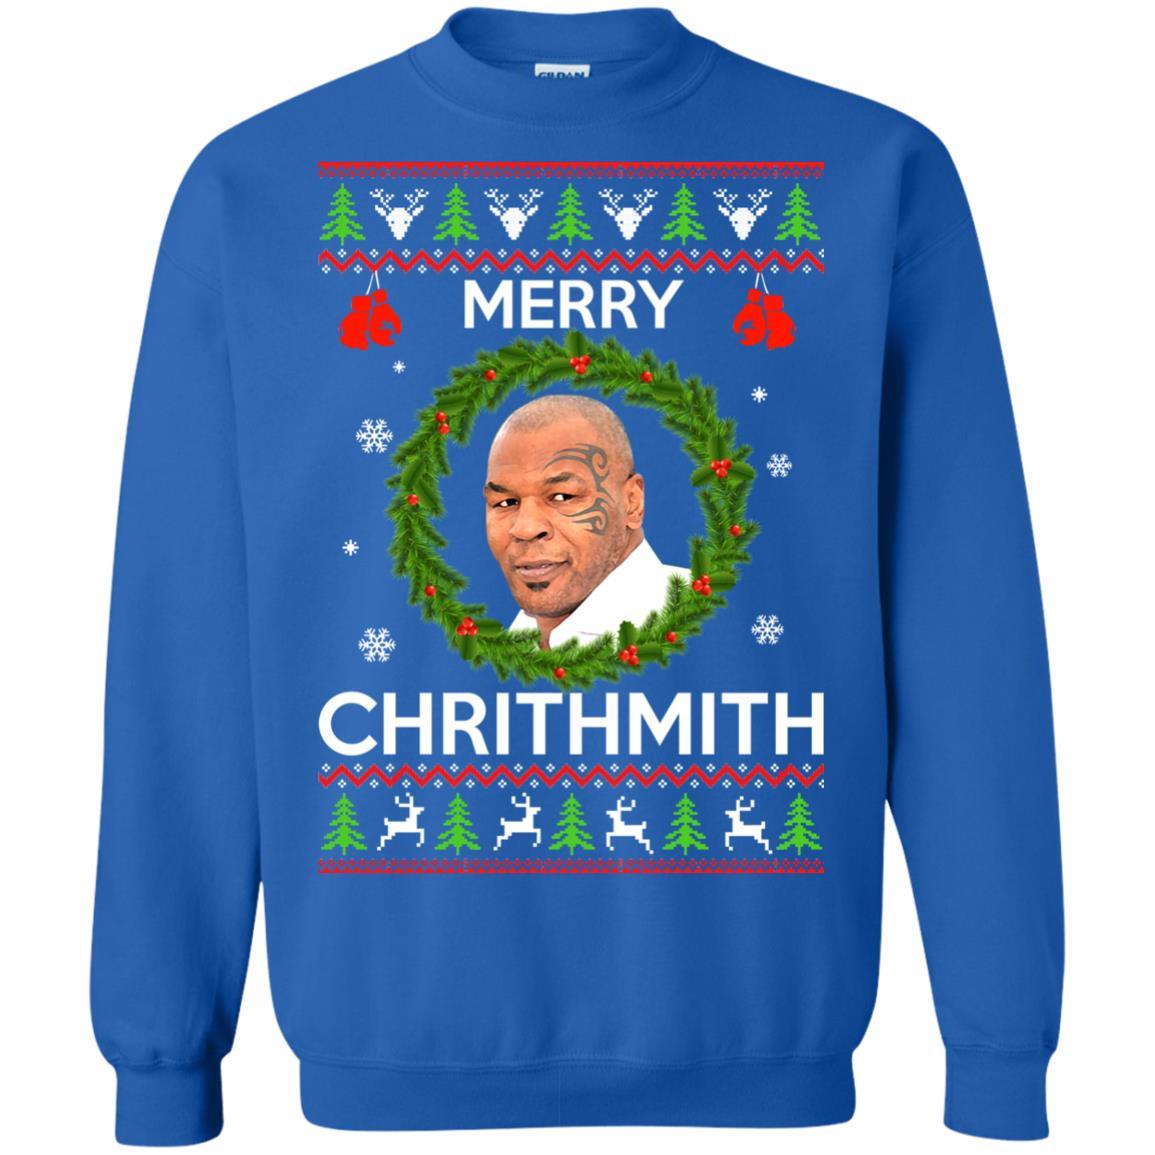 image 845px Mike Tyson Christmas Sweater Merry Chrithmith Sweatshirt